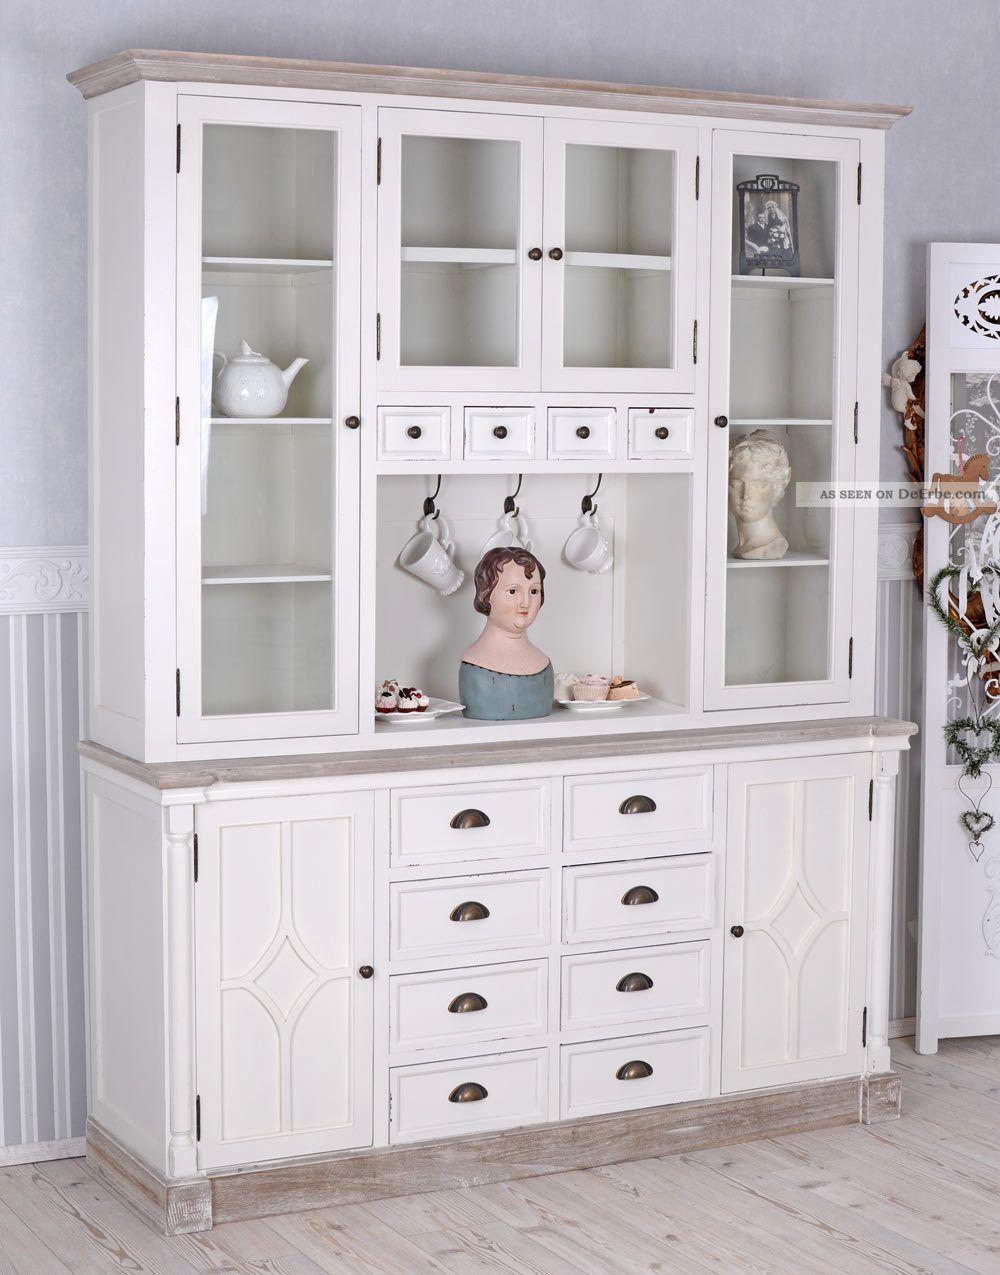 k 252 chenbuffet buffet weiss k 252 chenschrank vitrine b ware. Black Bedroom Furniture Sets. Home Design Ideas